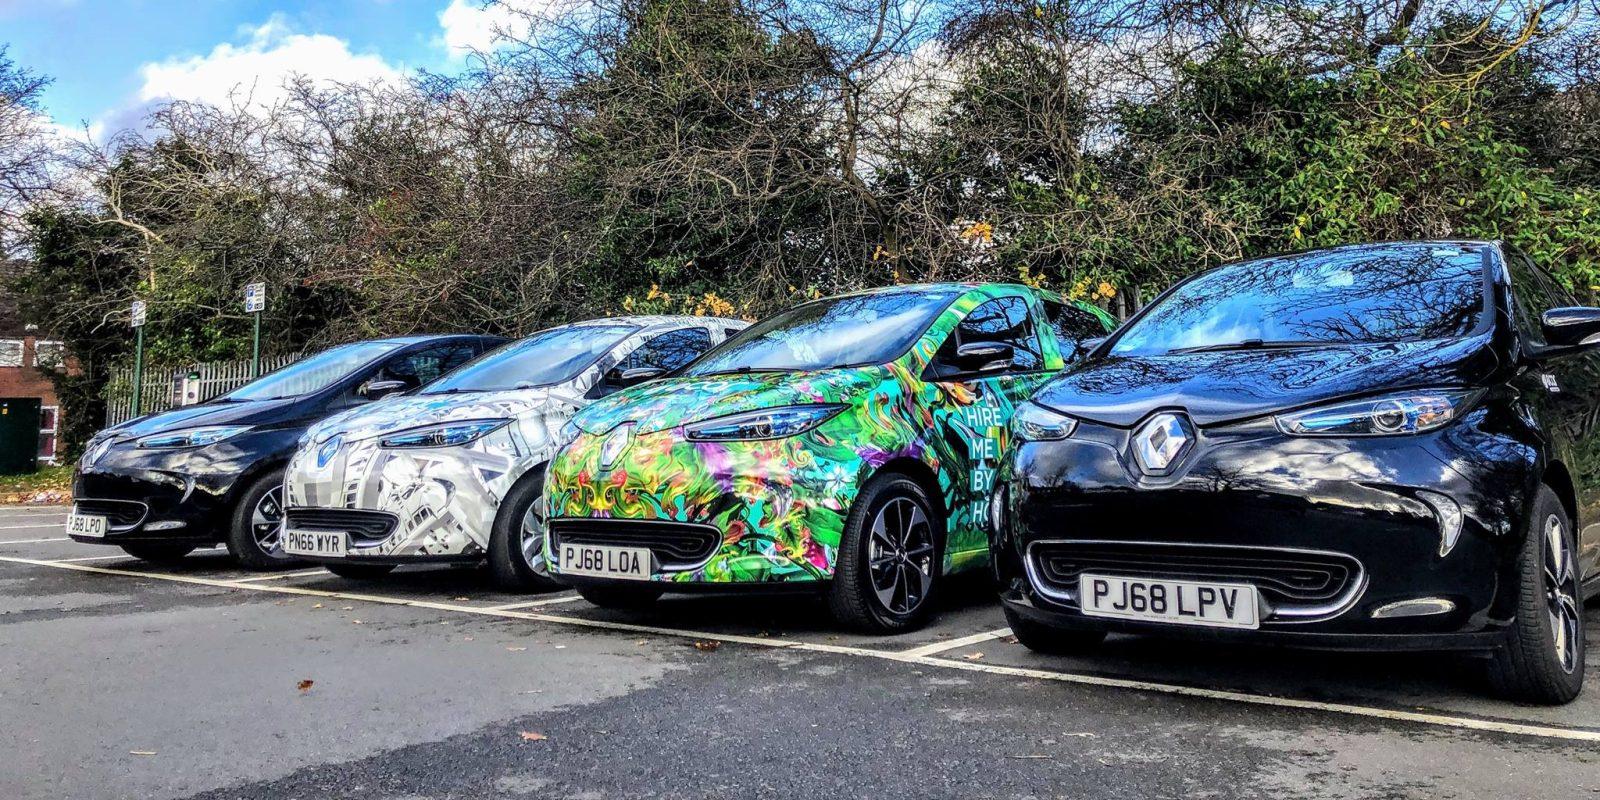 Vandals shut down UK electric car sharing program in months